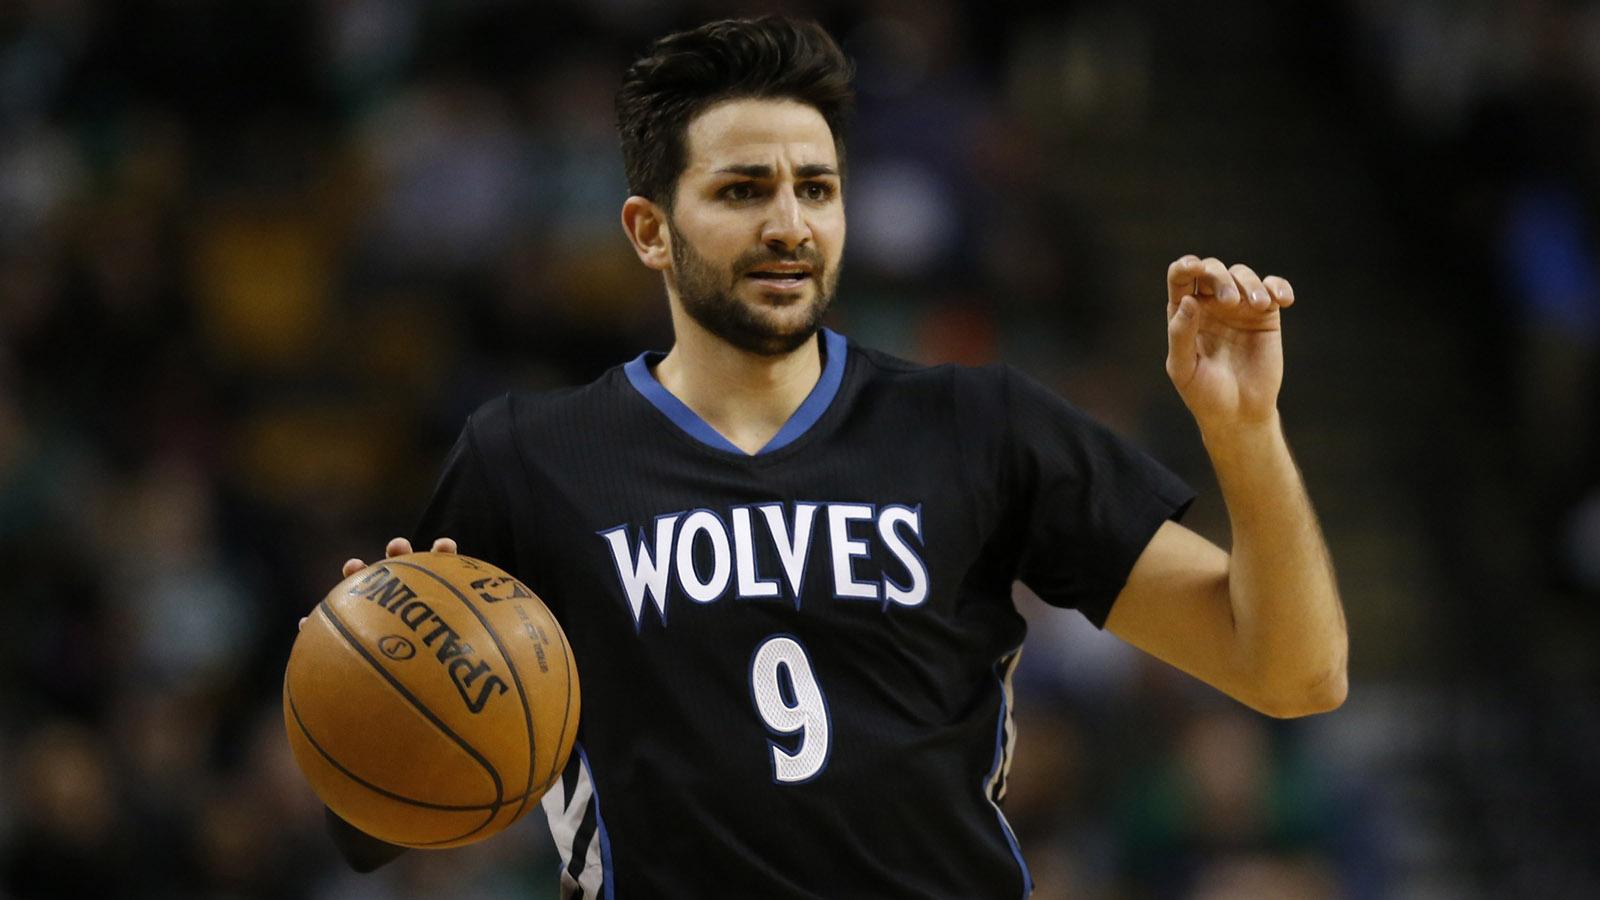 Wolves-Celtics Twi-lights: Rubio continues hot streak